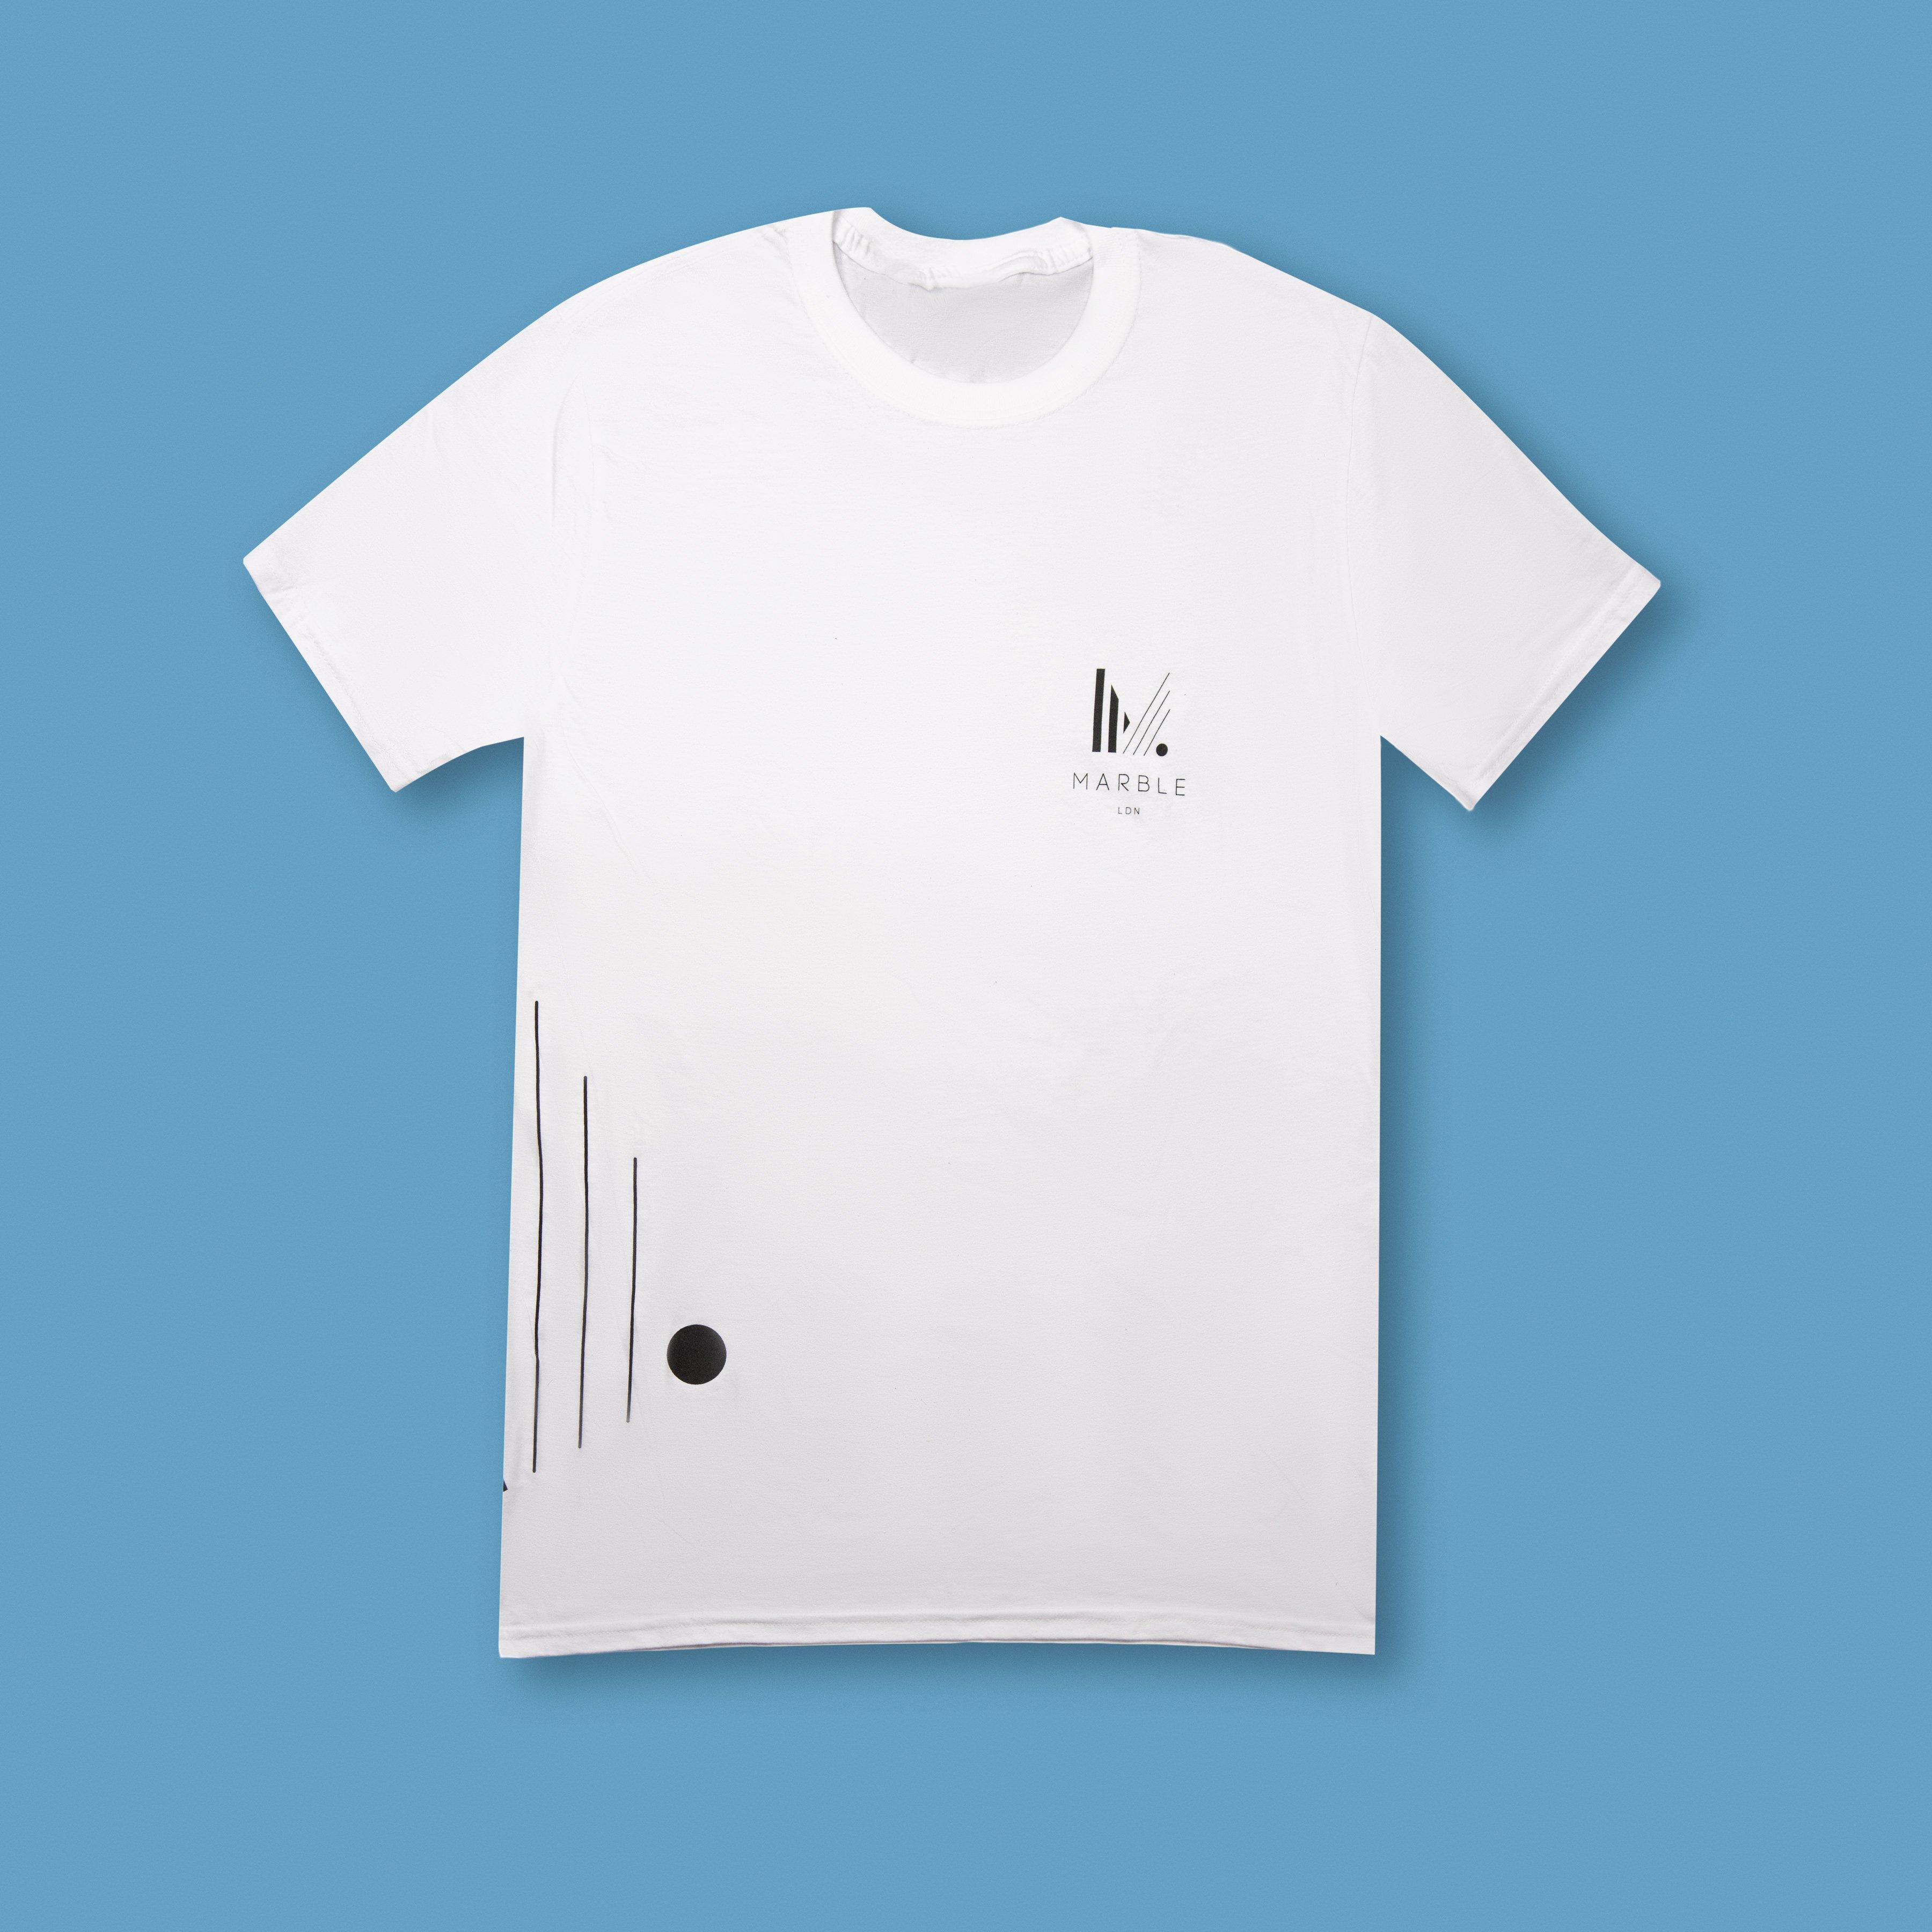 Giants Womens Shirts